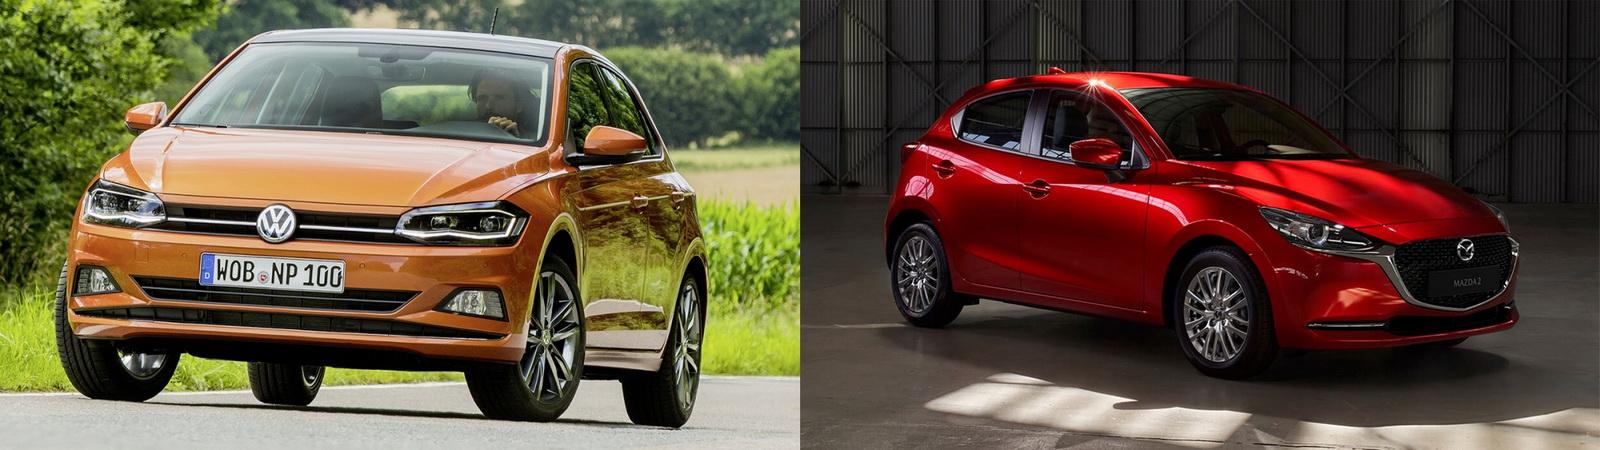 圖/Volkswagen Polo 230 TSI Life與Mazda 2 1.5旗艦安全型之小型掀背車之戰。